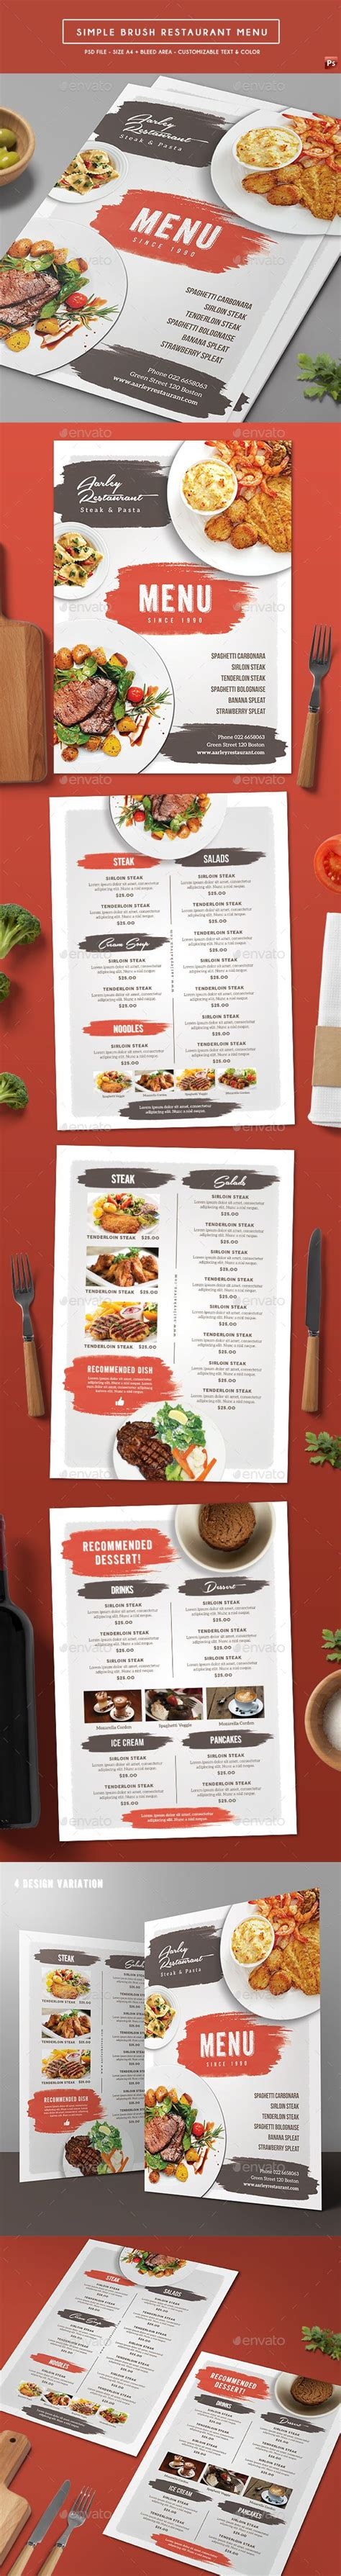 top 15 free restaurant menu psd templates for cuisine business of